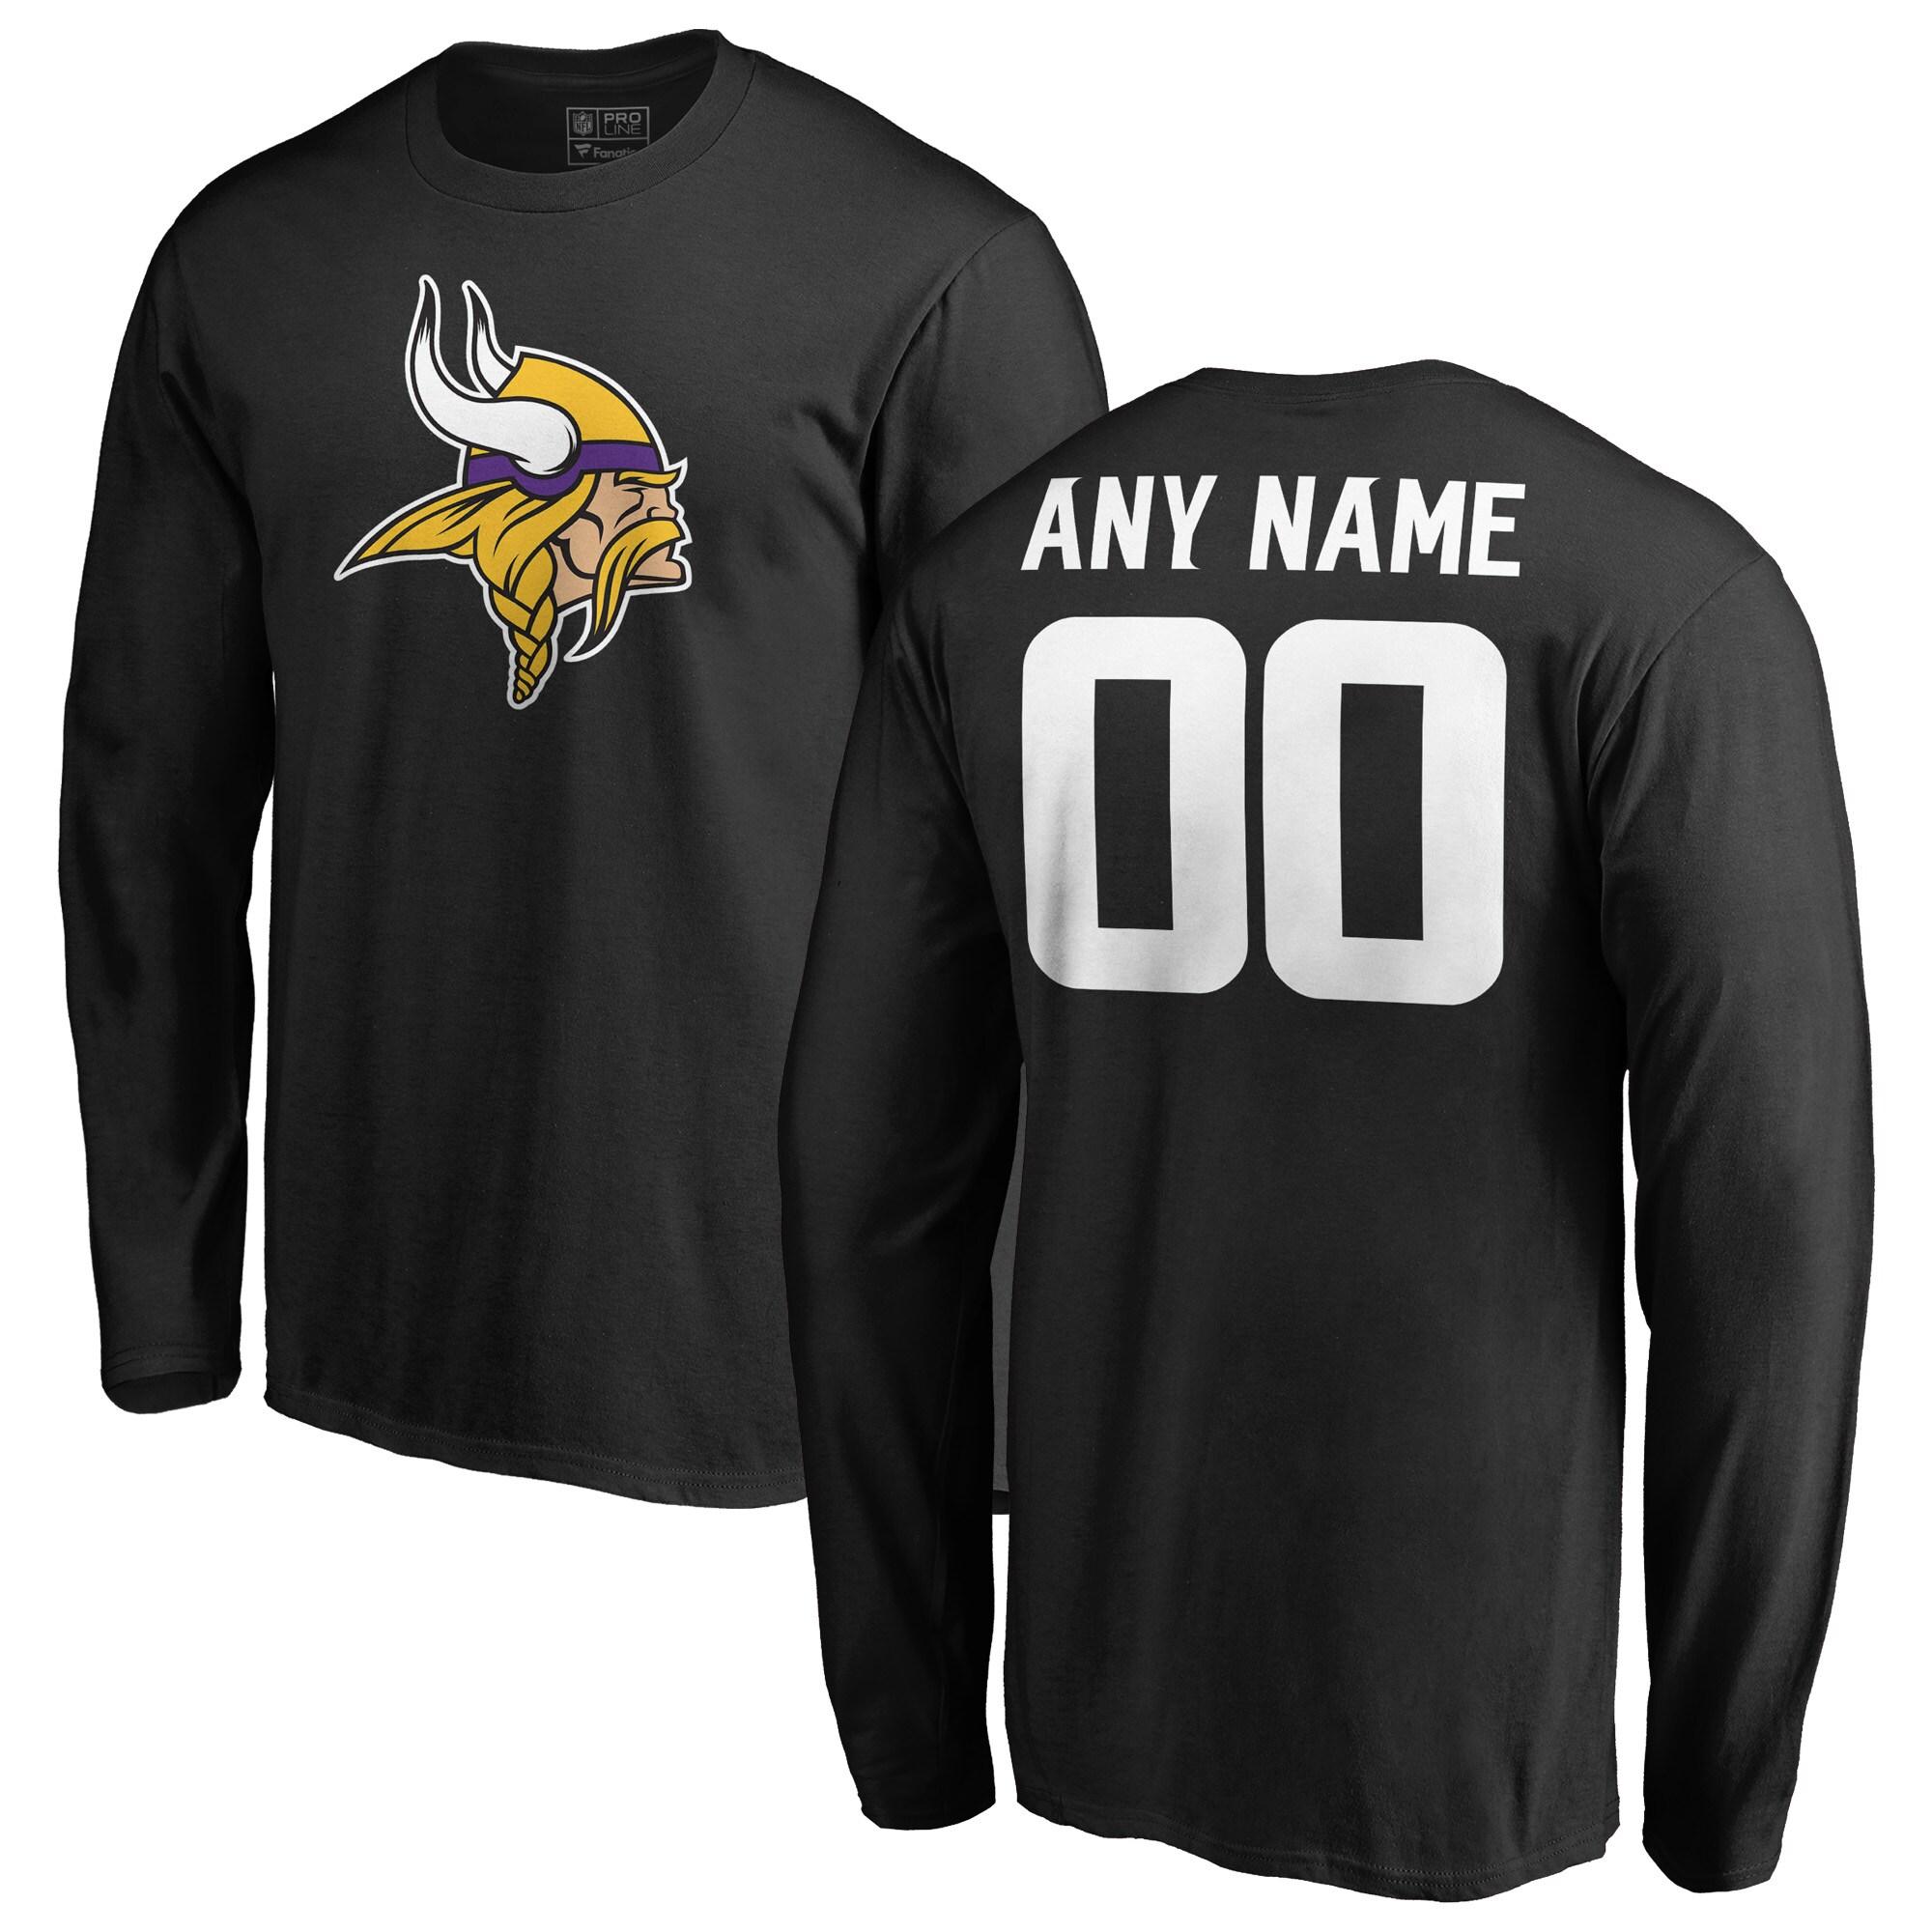 Minnesota Vikings NFL Pro Line Personalized Name & Number Logo Long Sleeve T-Shirt - Black